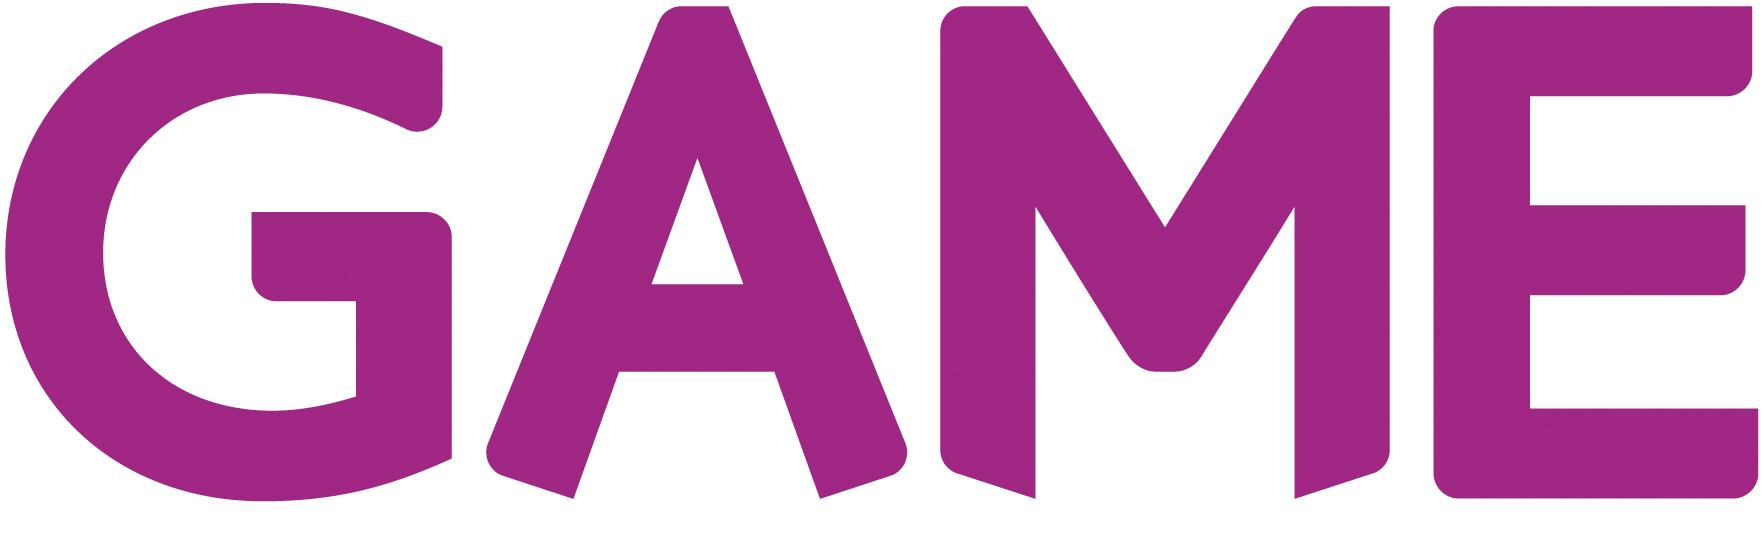 game-logo-compra-gamestop-frikarte.jpg